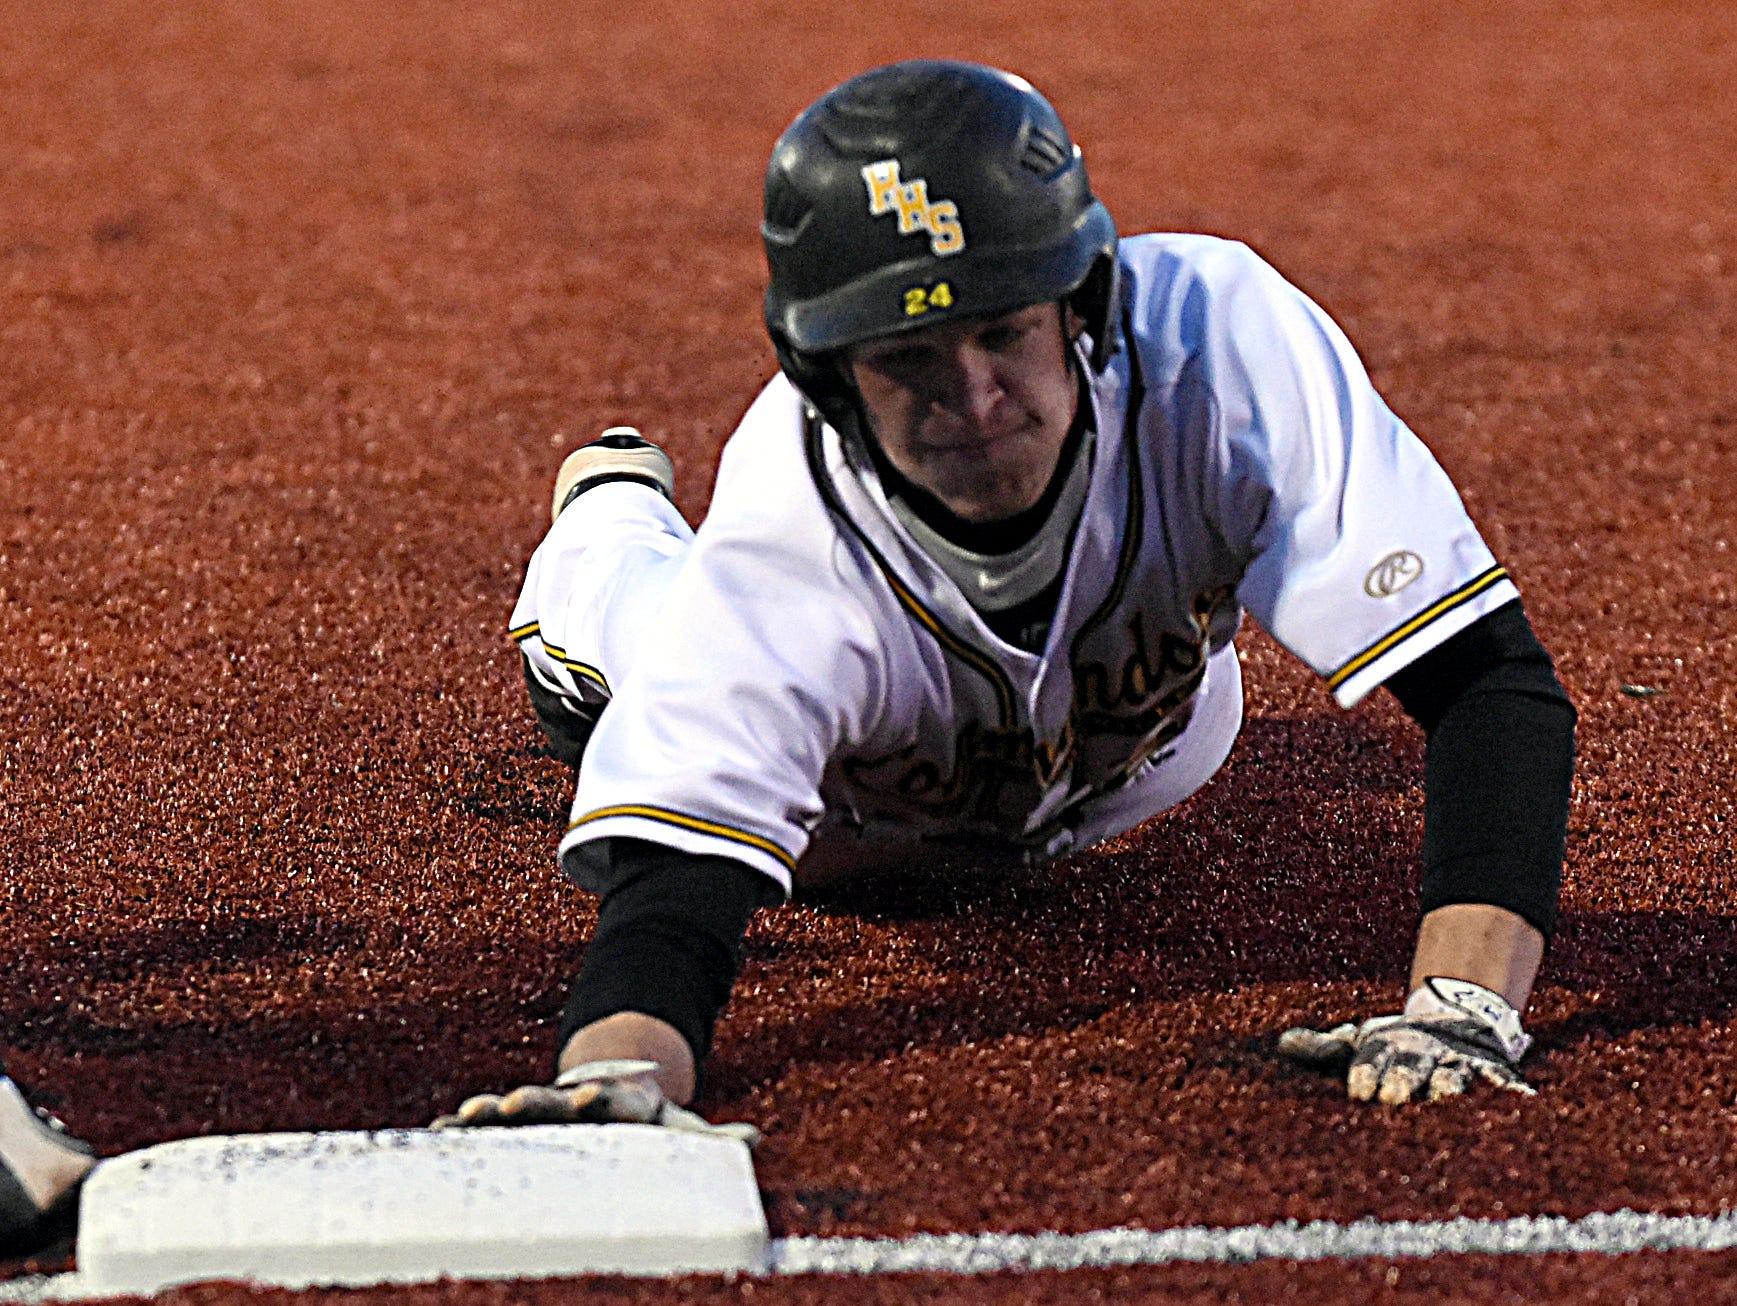 Hendersonville High senior Aris Welden slides safely back into first base during the first inning.